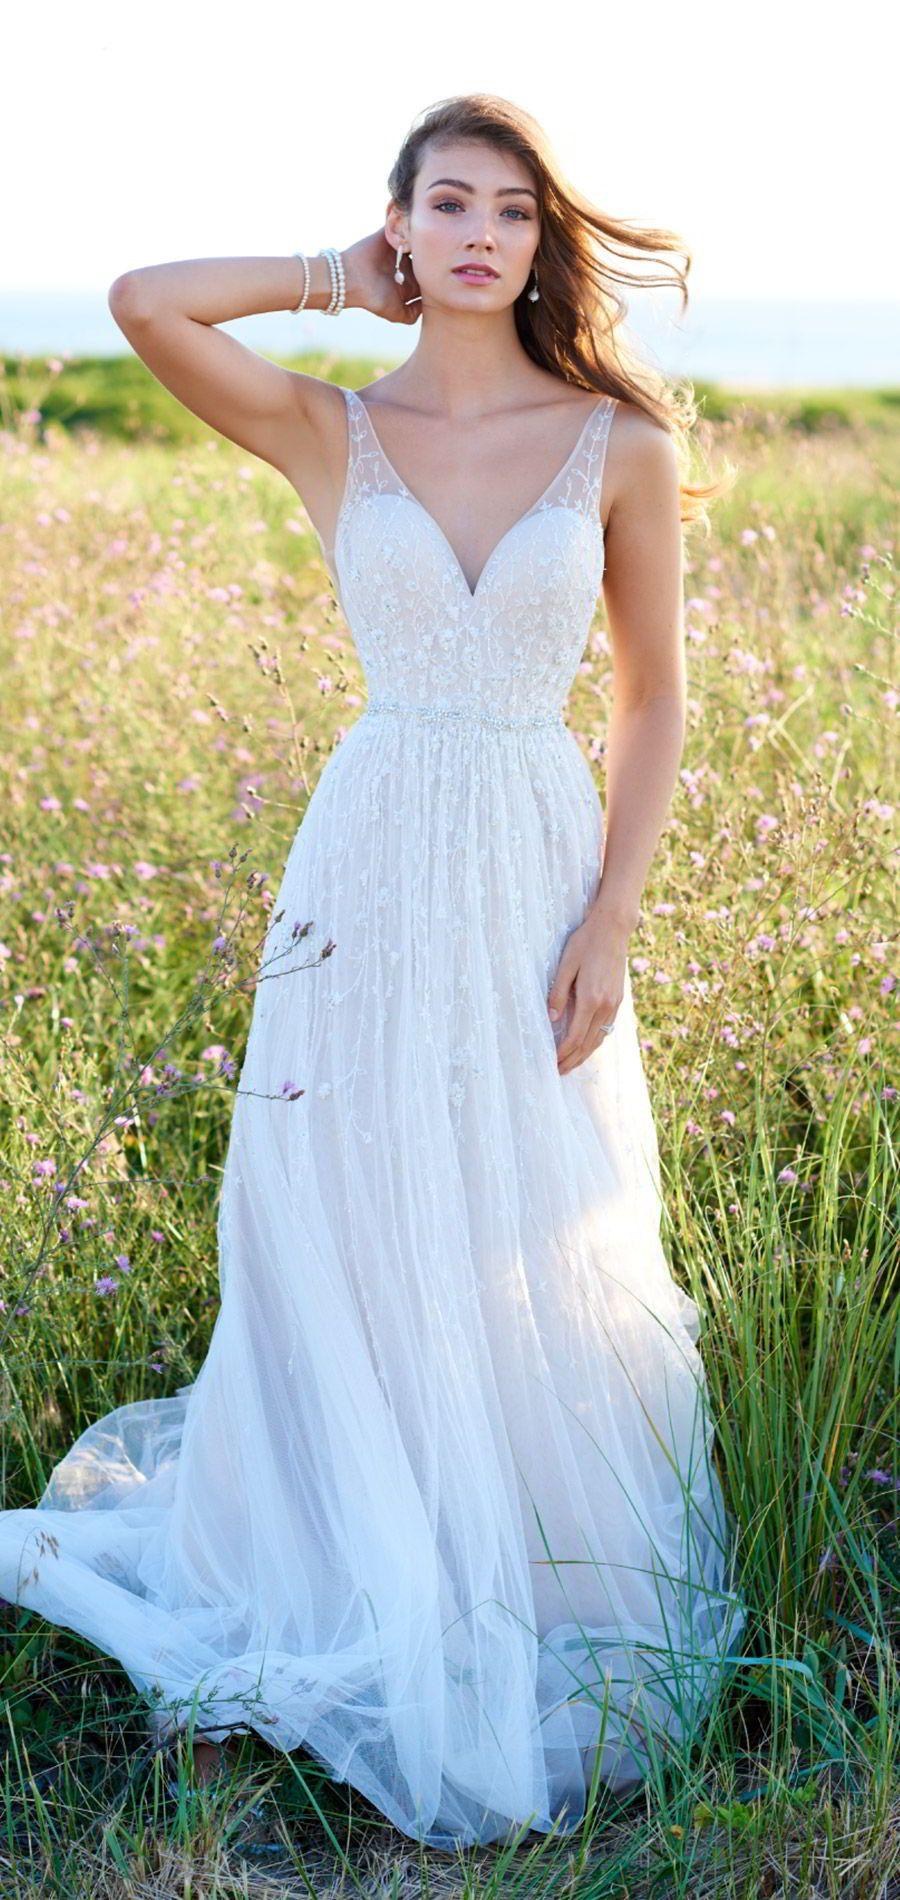 Spring wedding dresses from mon cheri bridals u stunning